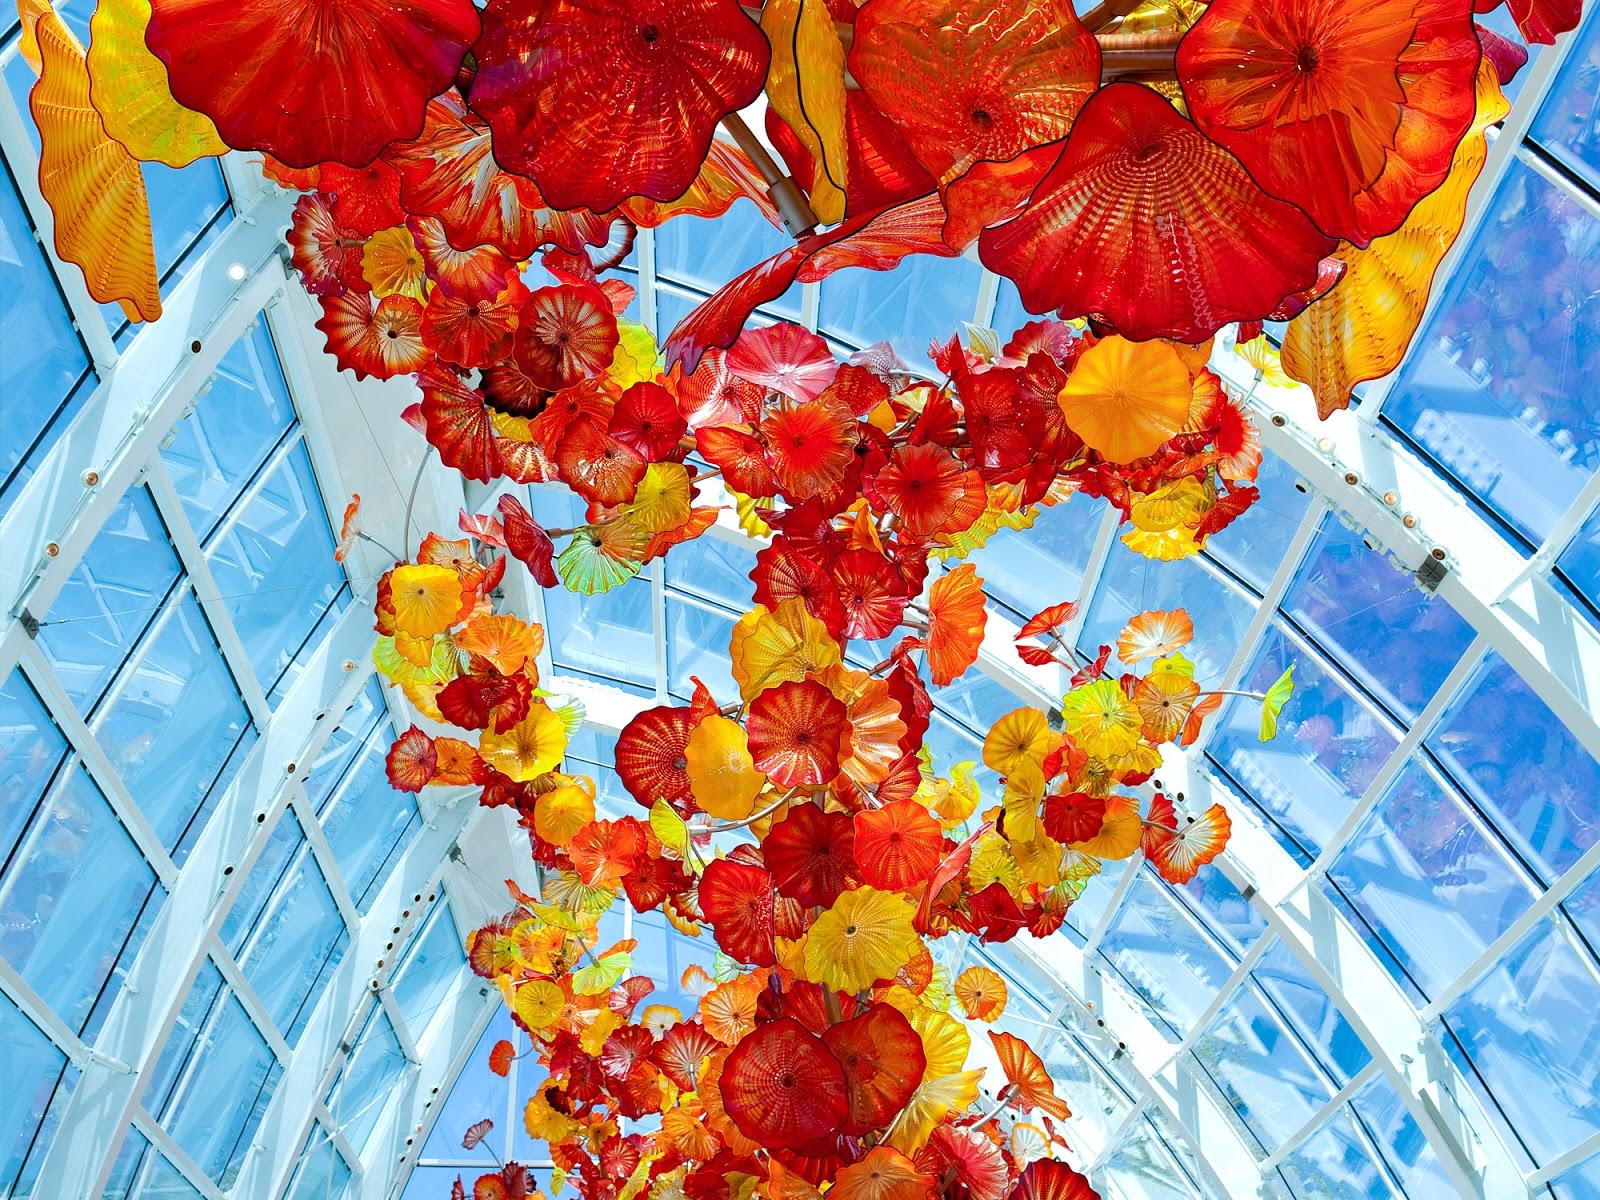 The Lenkerville Art Room Monday Motivations Dale Chihuly 39 S Glass 25 Nov 2013